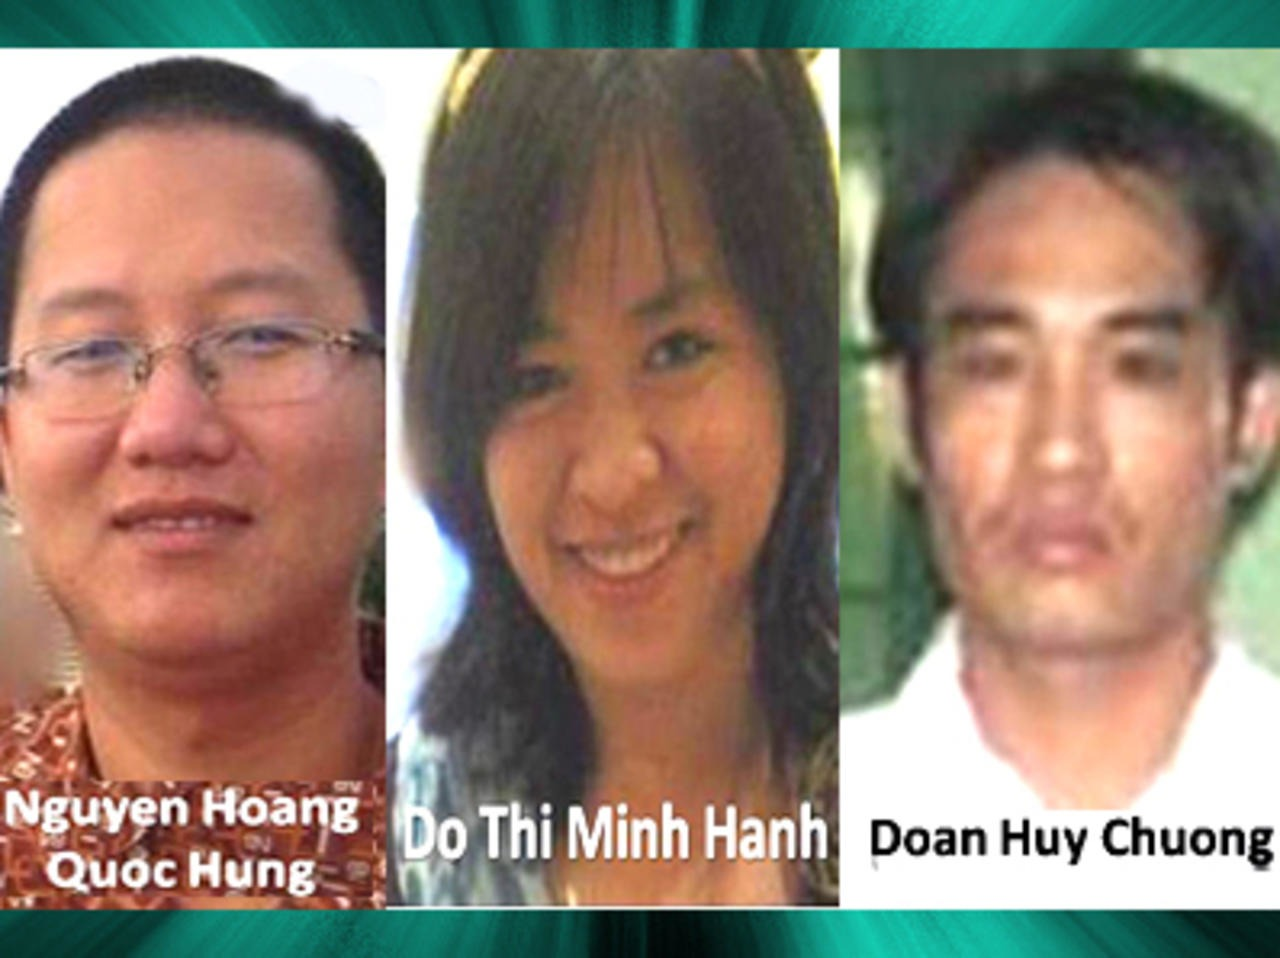 Doan Huy Chuong, Do Thi Minh Hanh, and Nguyen Hoang Quoc Hung